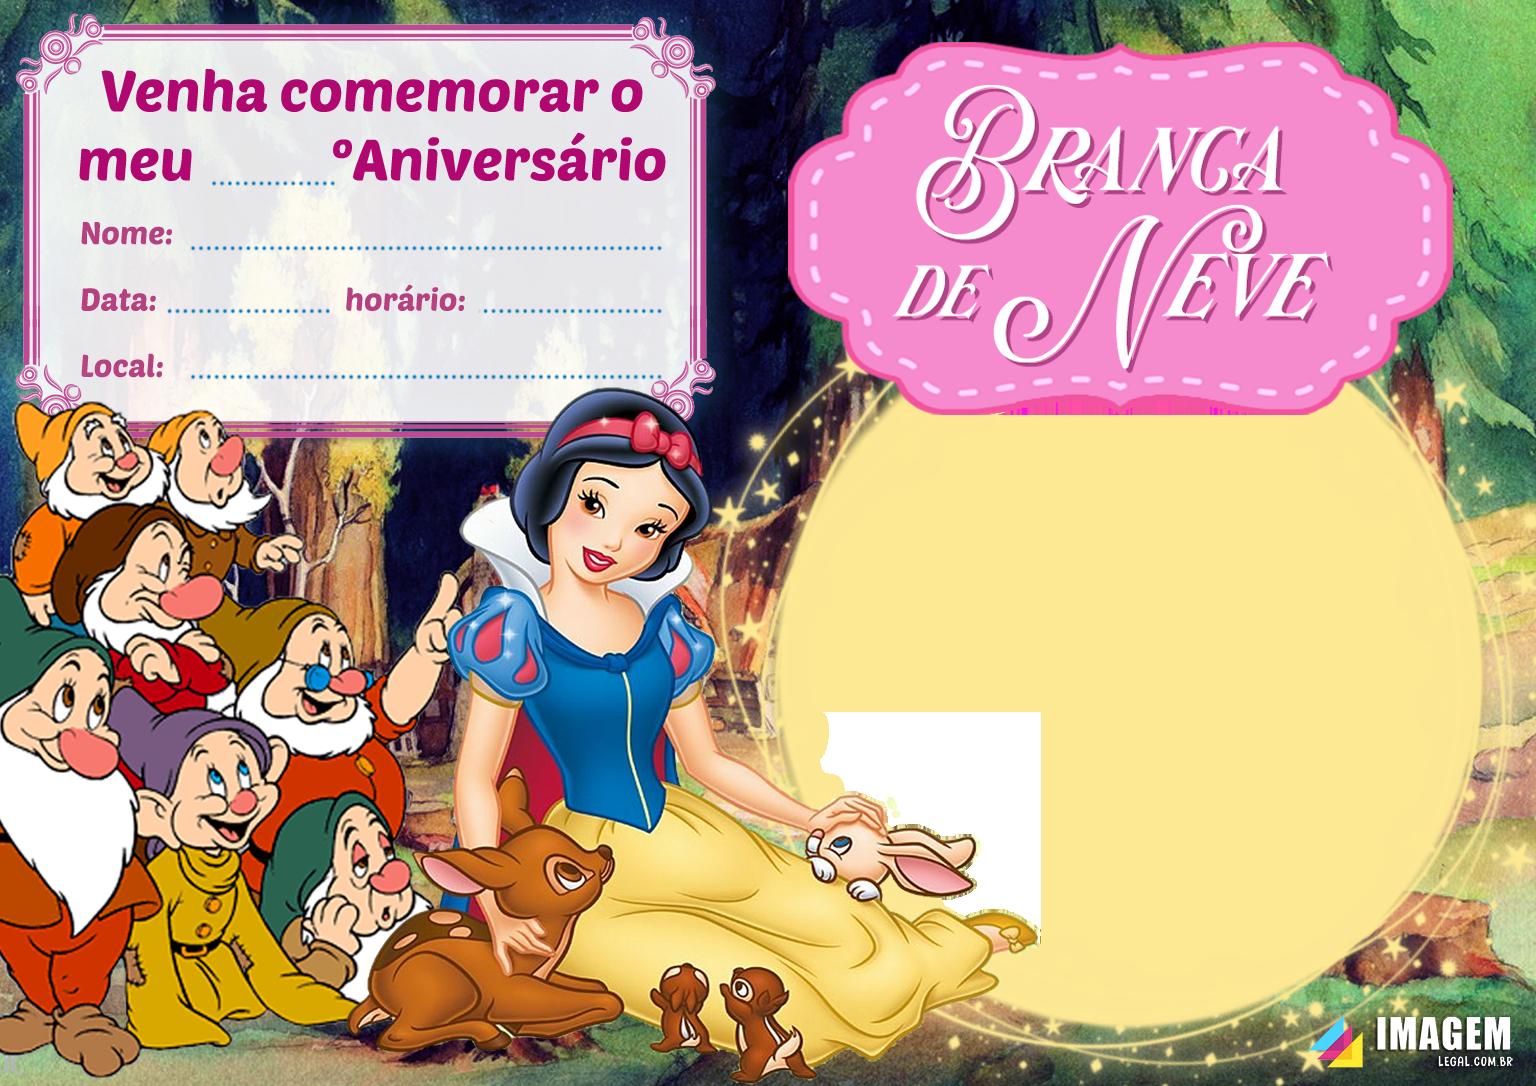 Convite De Aniversario Da Branca De Neve Imagem Legal